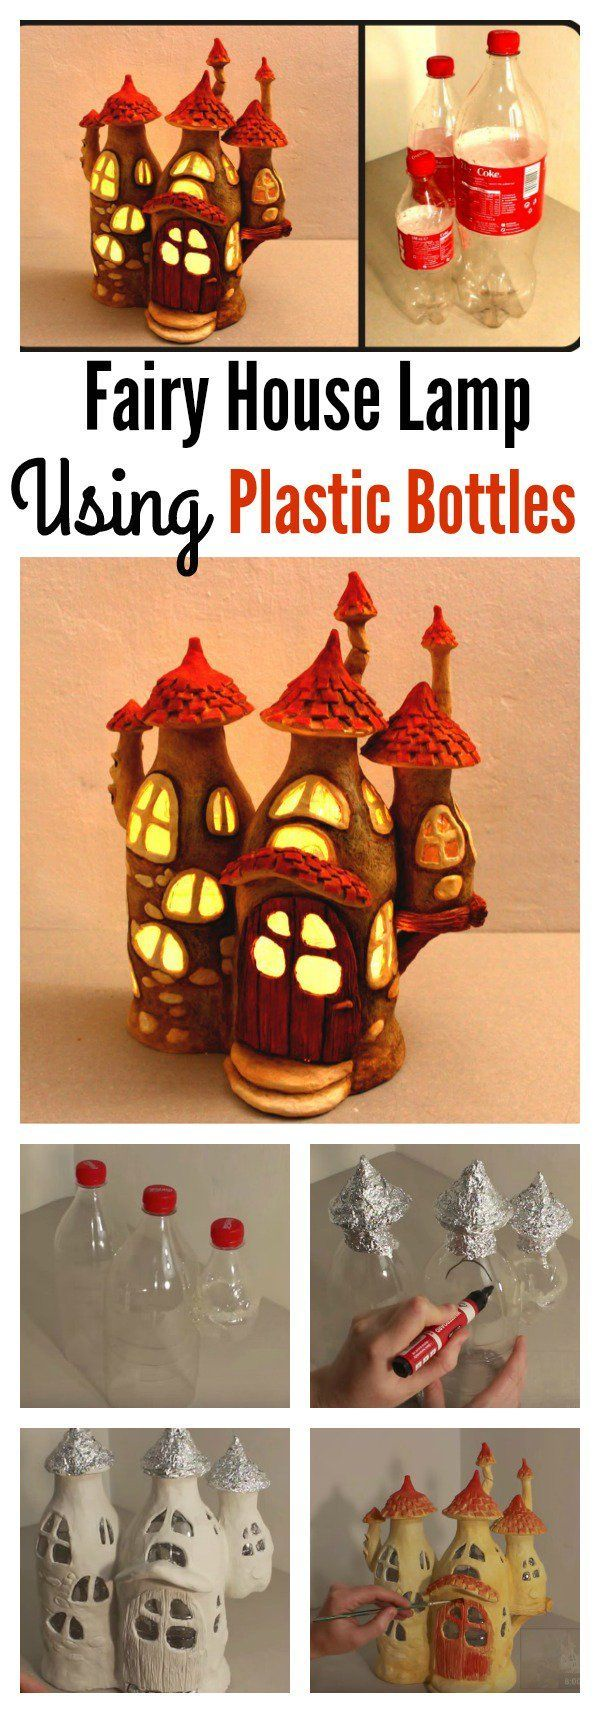 Lampada da Casa Fairy di Fai da te Utilizzo di Bottiglie di Plastica